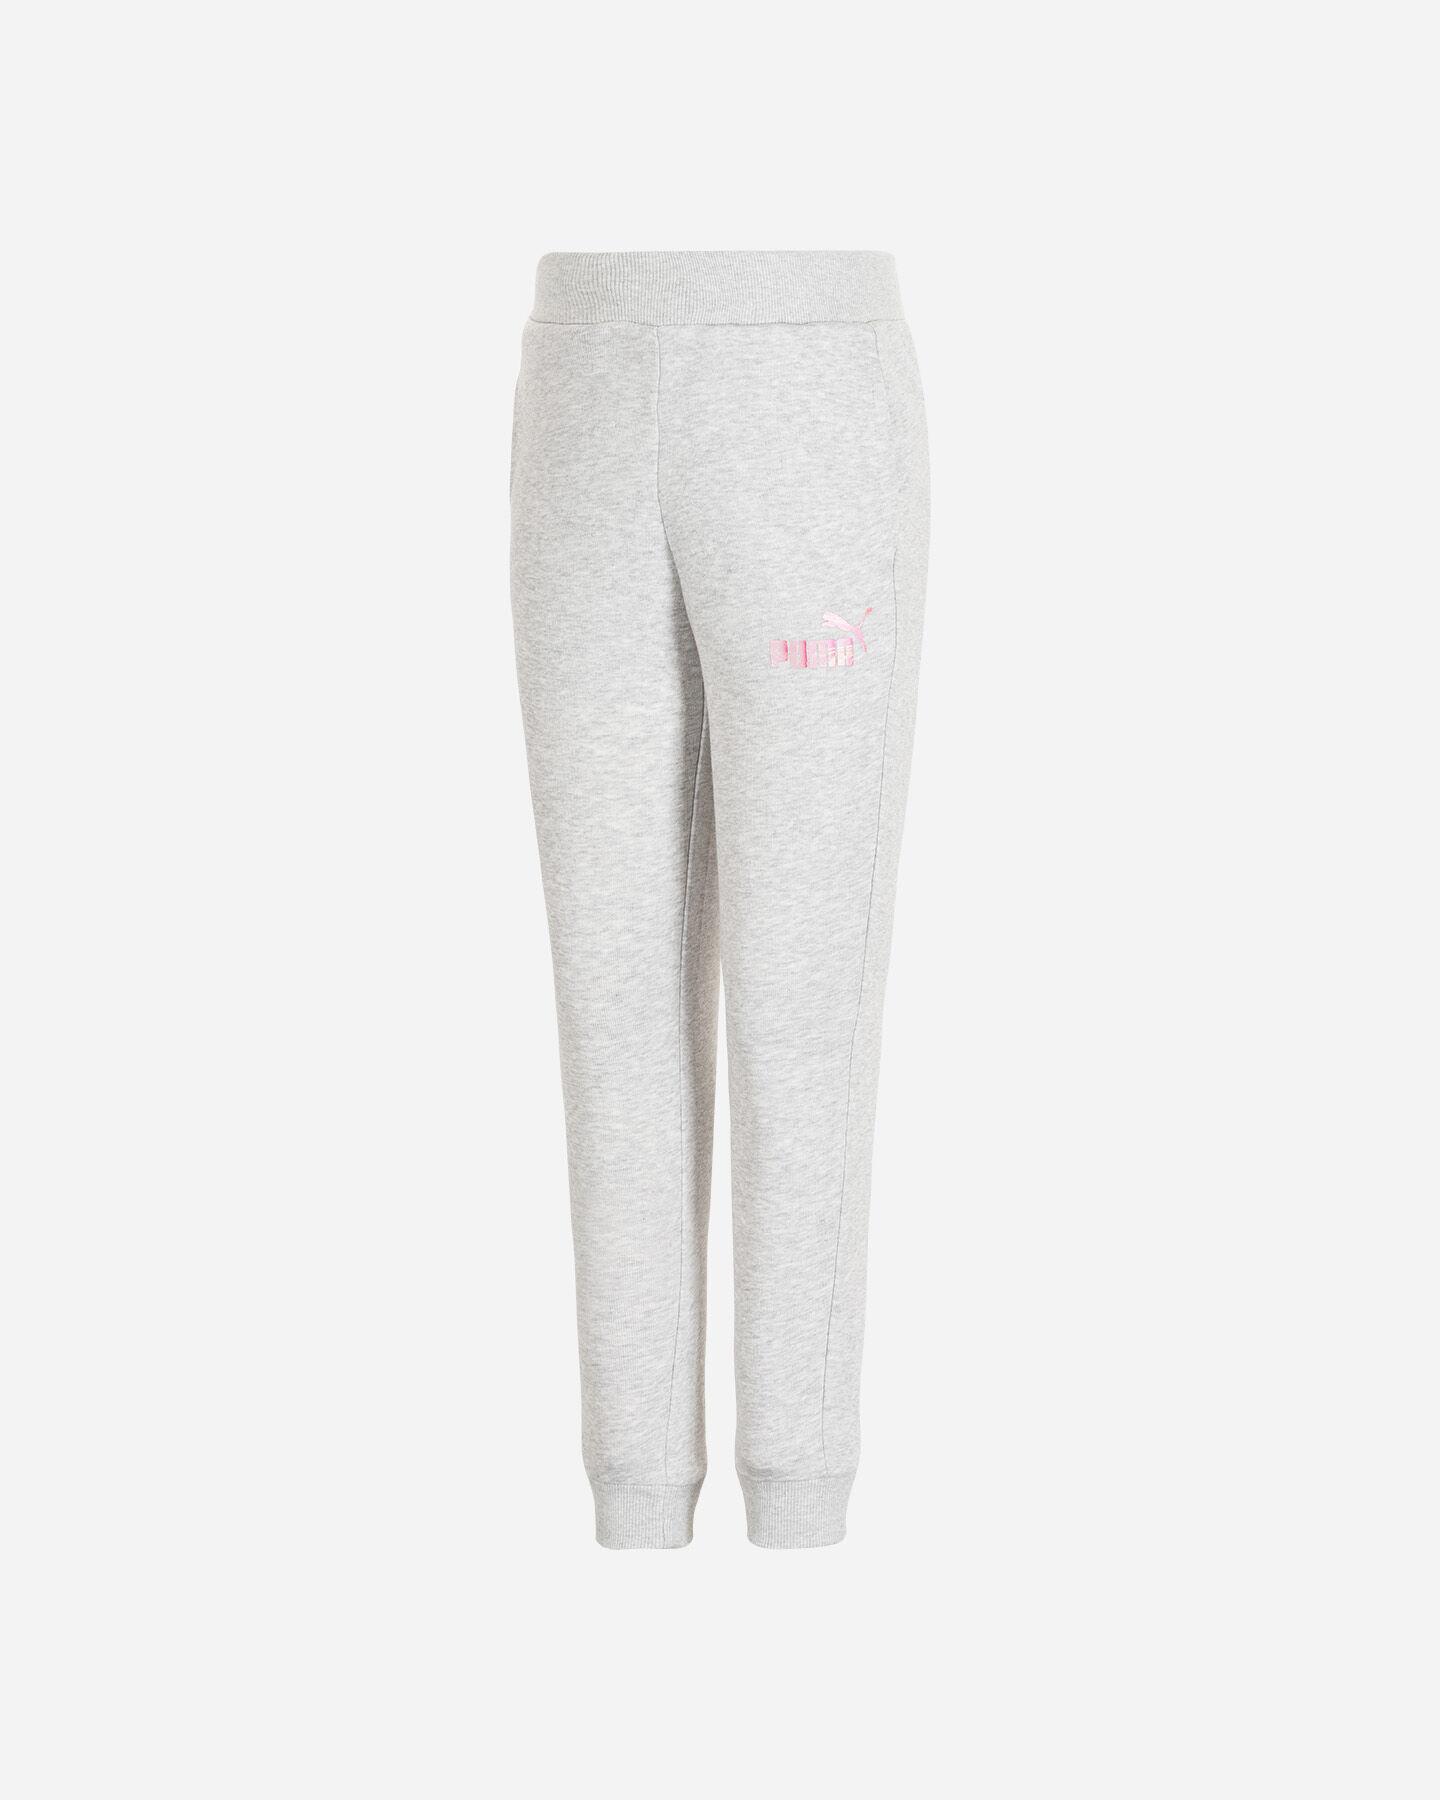 Pantalone PUMA BASIC JR S5339170 scatto 0